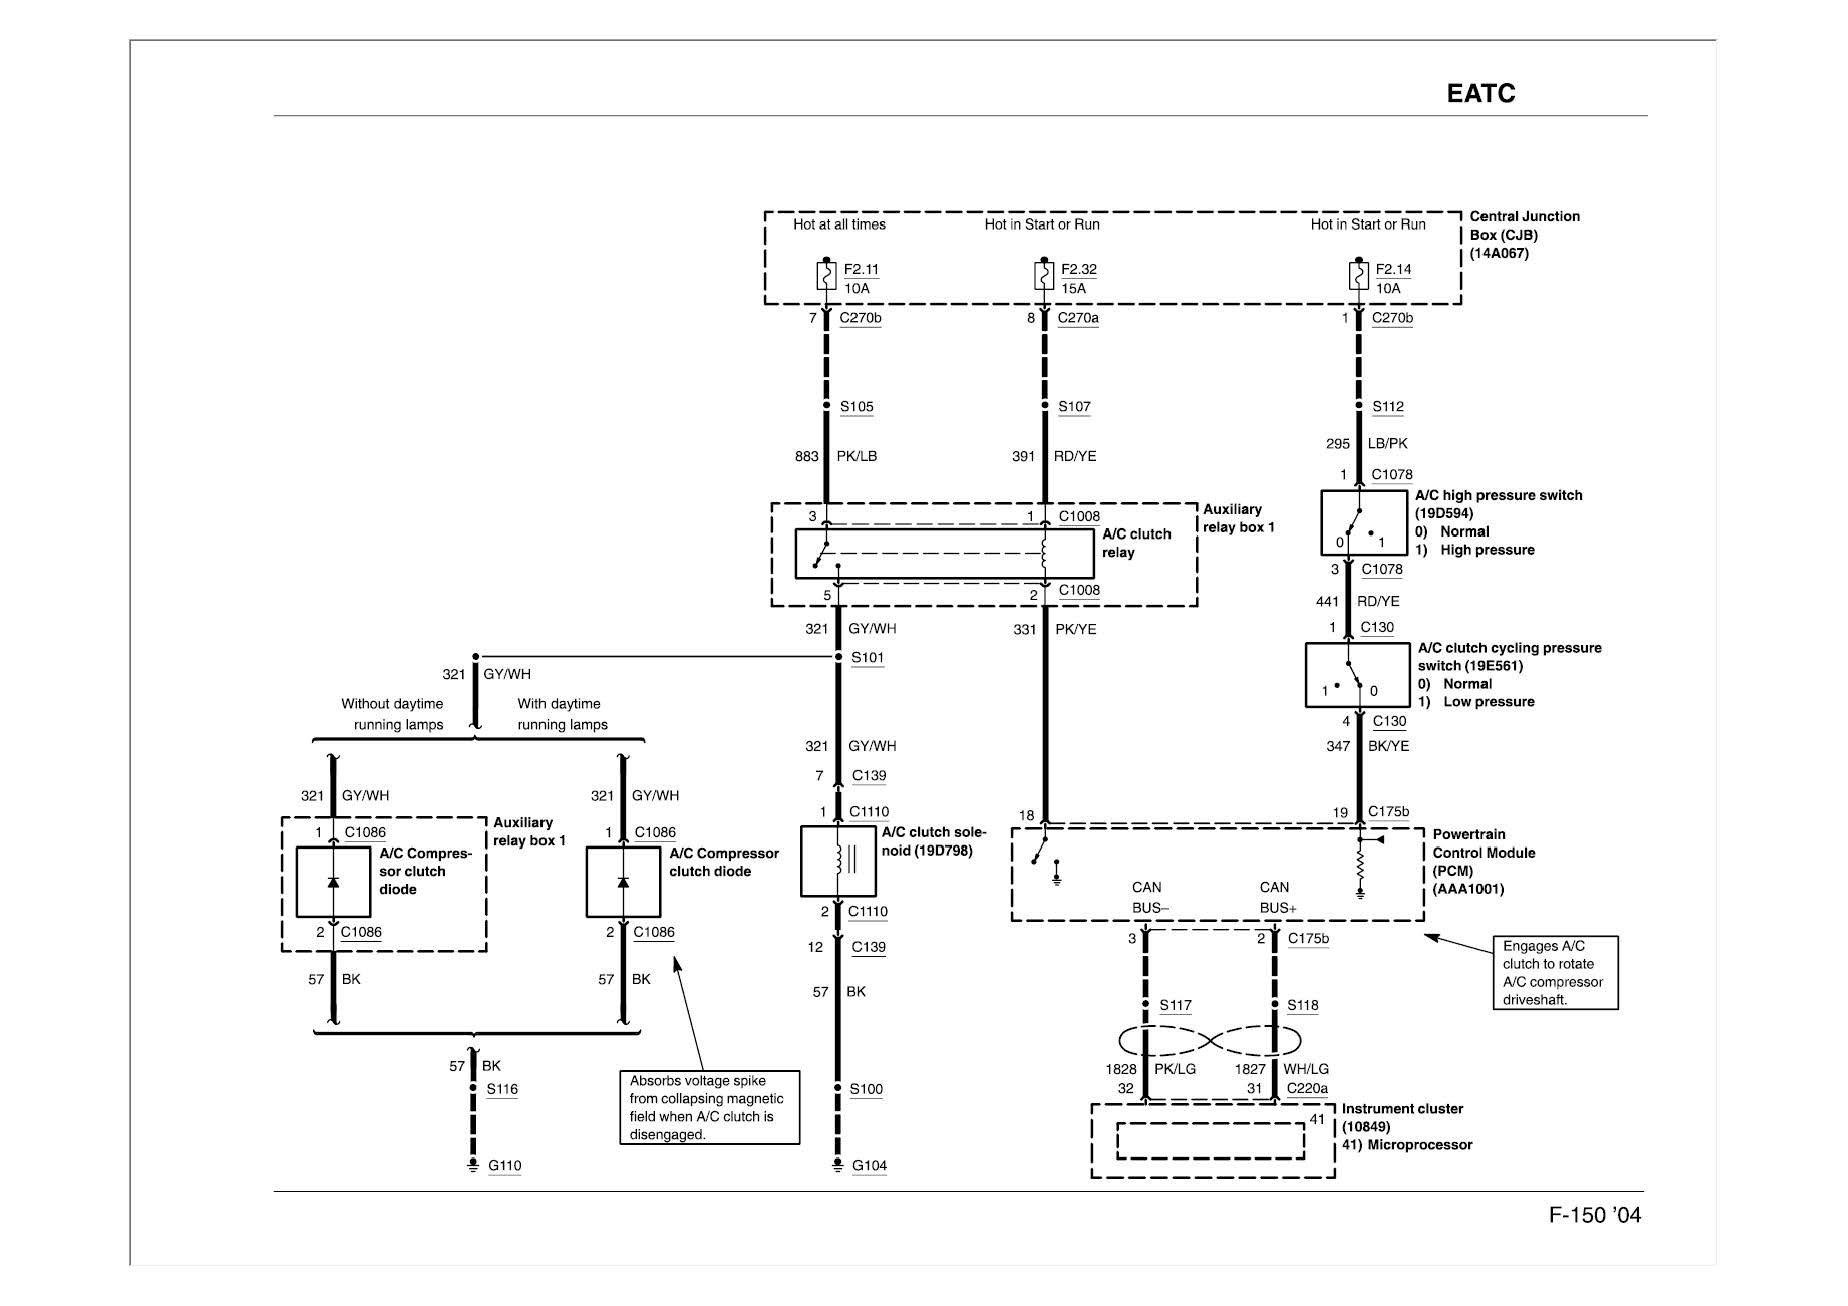 2005 Ford F 150 Ac Diagram - Data Wiring Pair host-realism -  host-realism.newmorpheus.it | Ford F150 Air Conditioning Wiring Diagram |  | newmorpheus.it